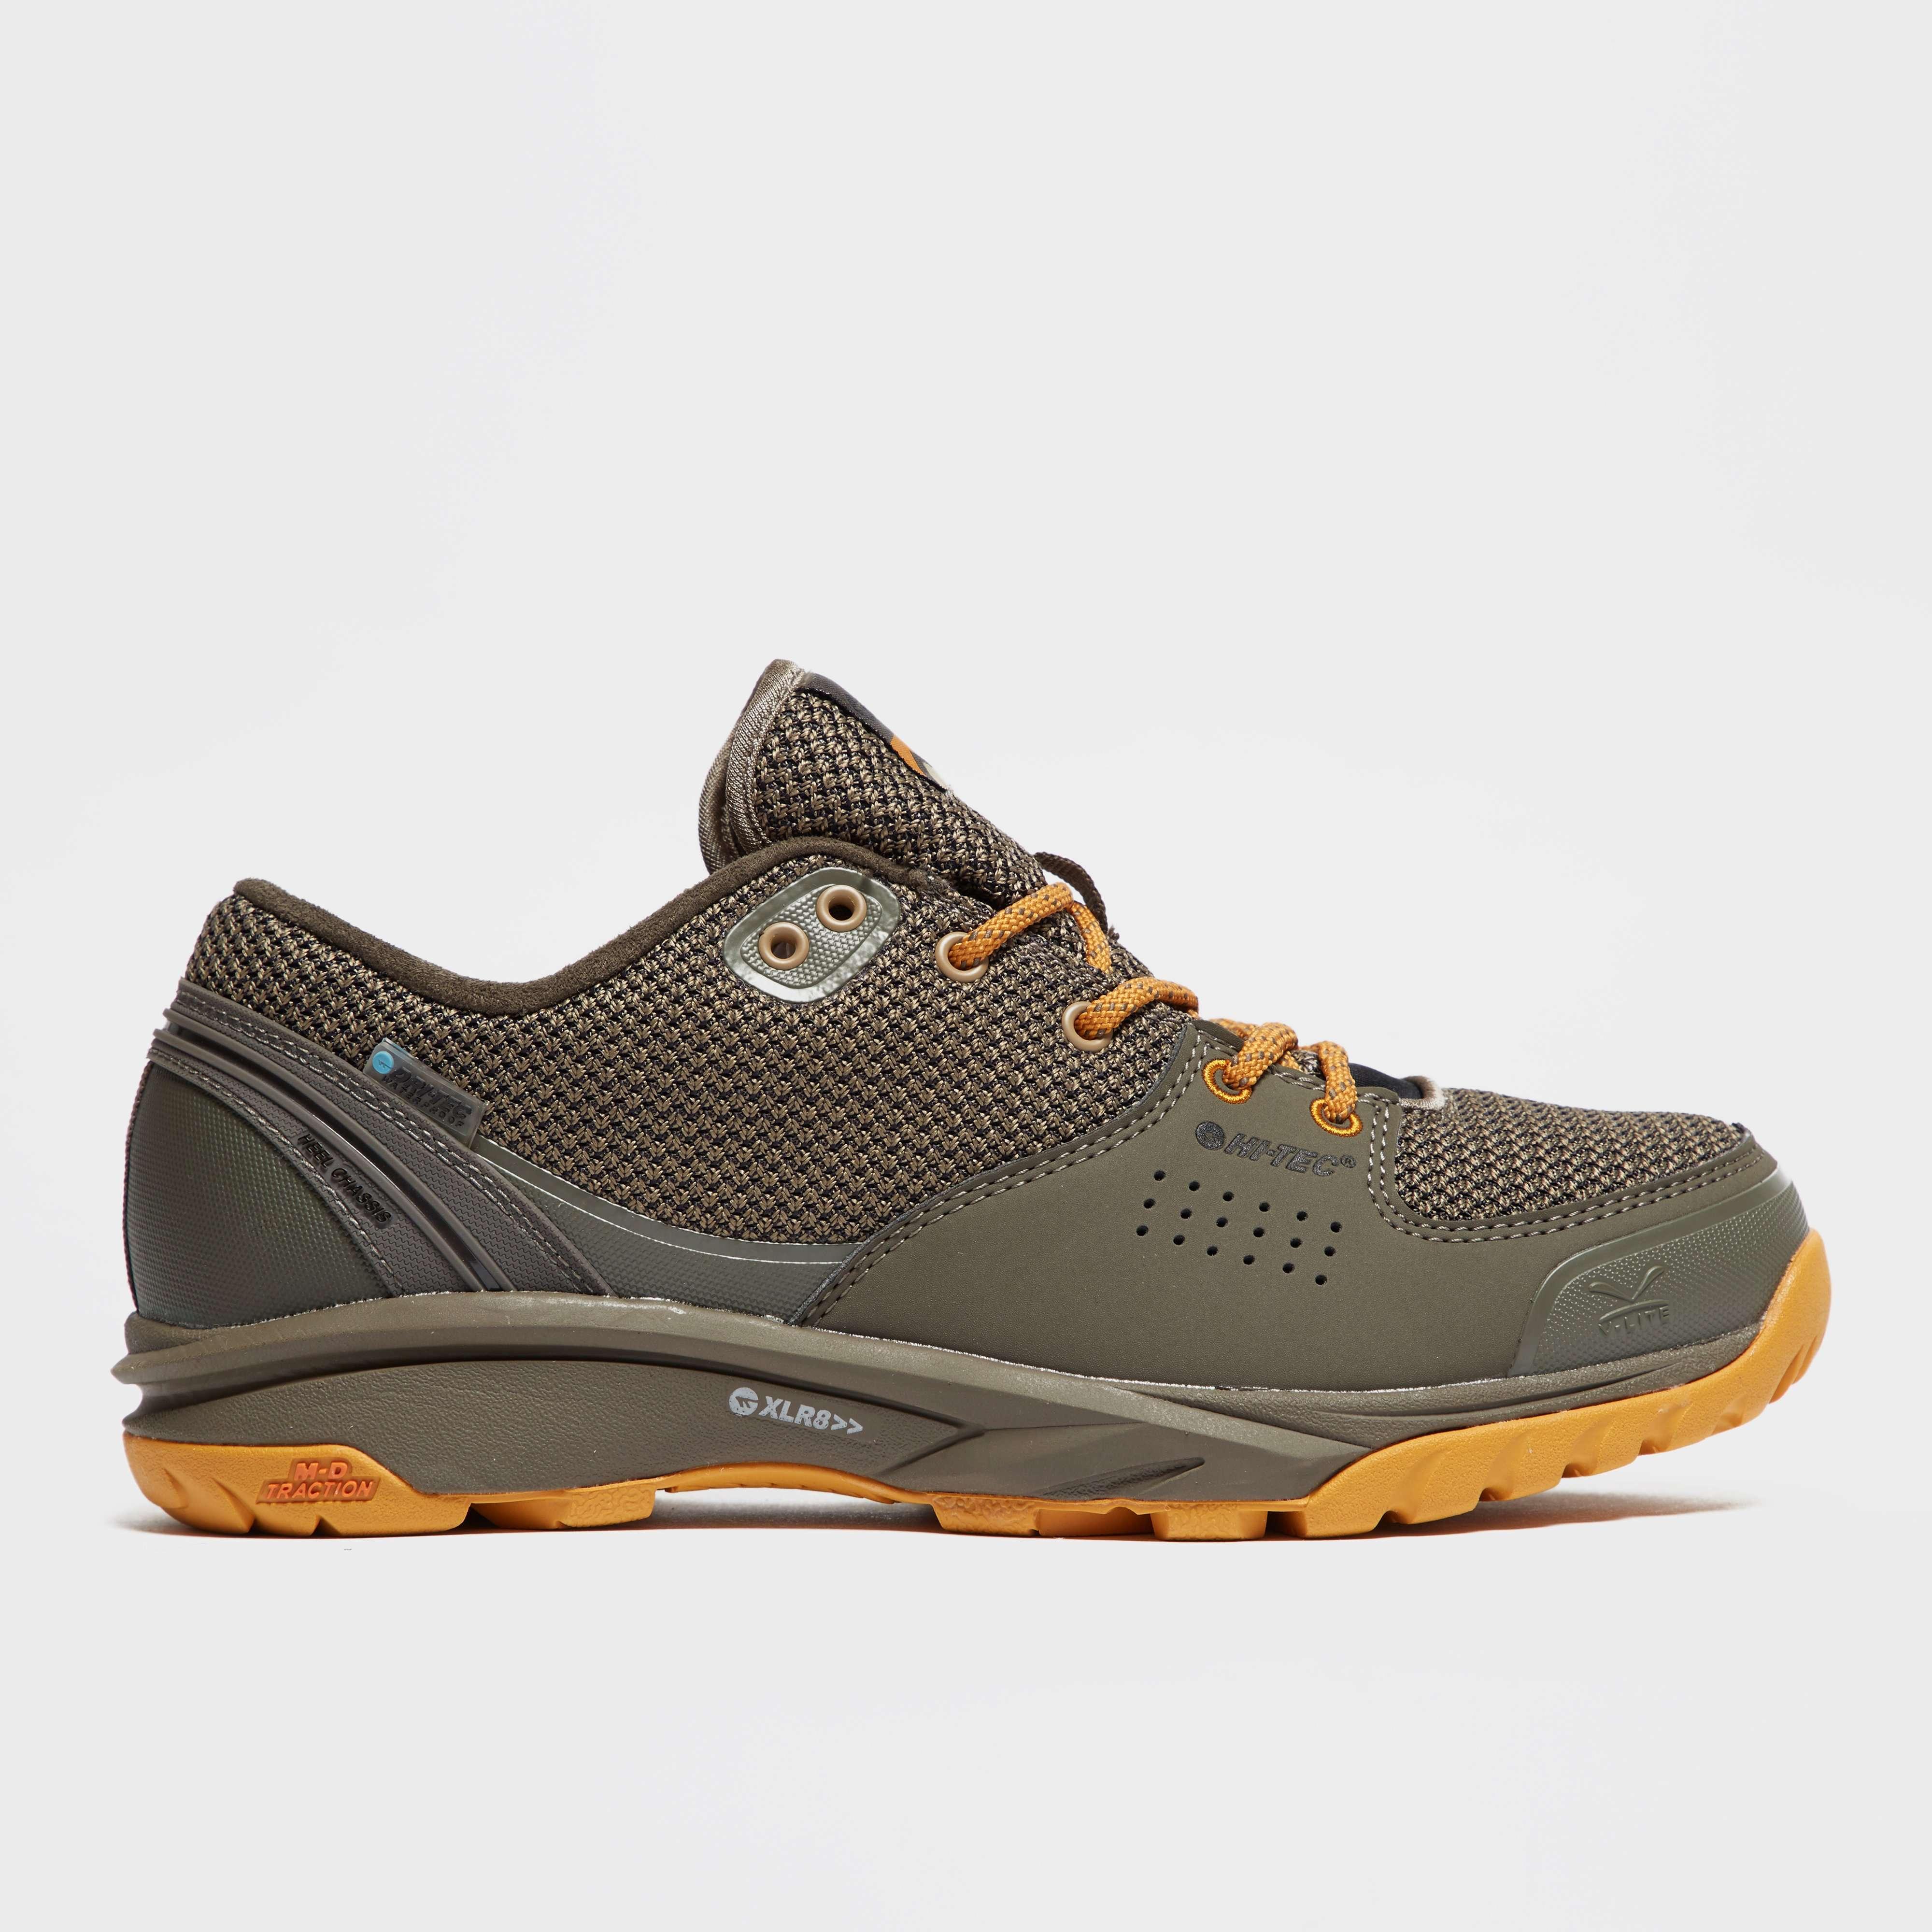 HI TEC Men's V-Lite WildLife Low Waterproof Walking Shoe